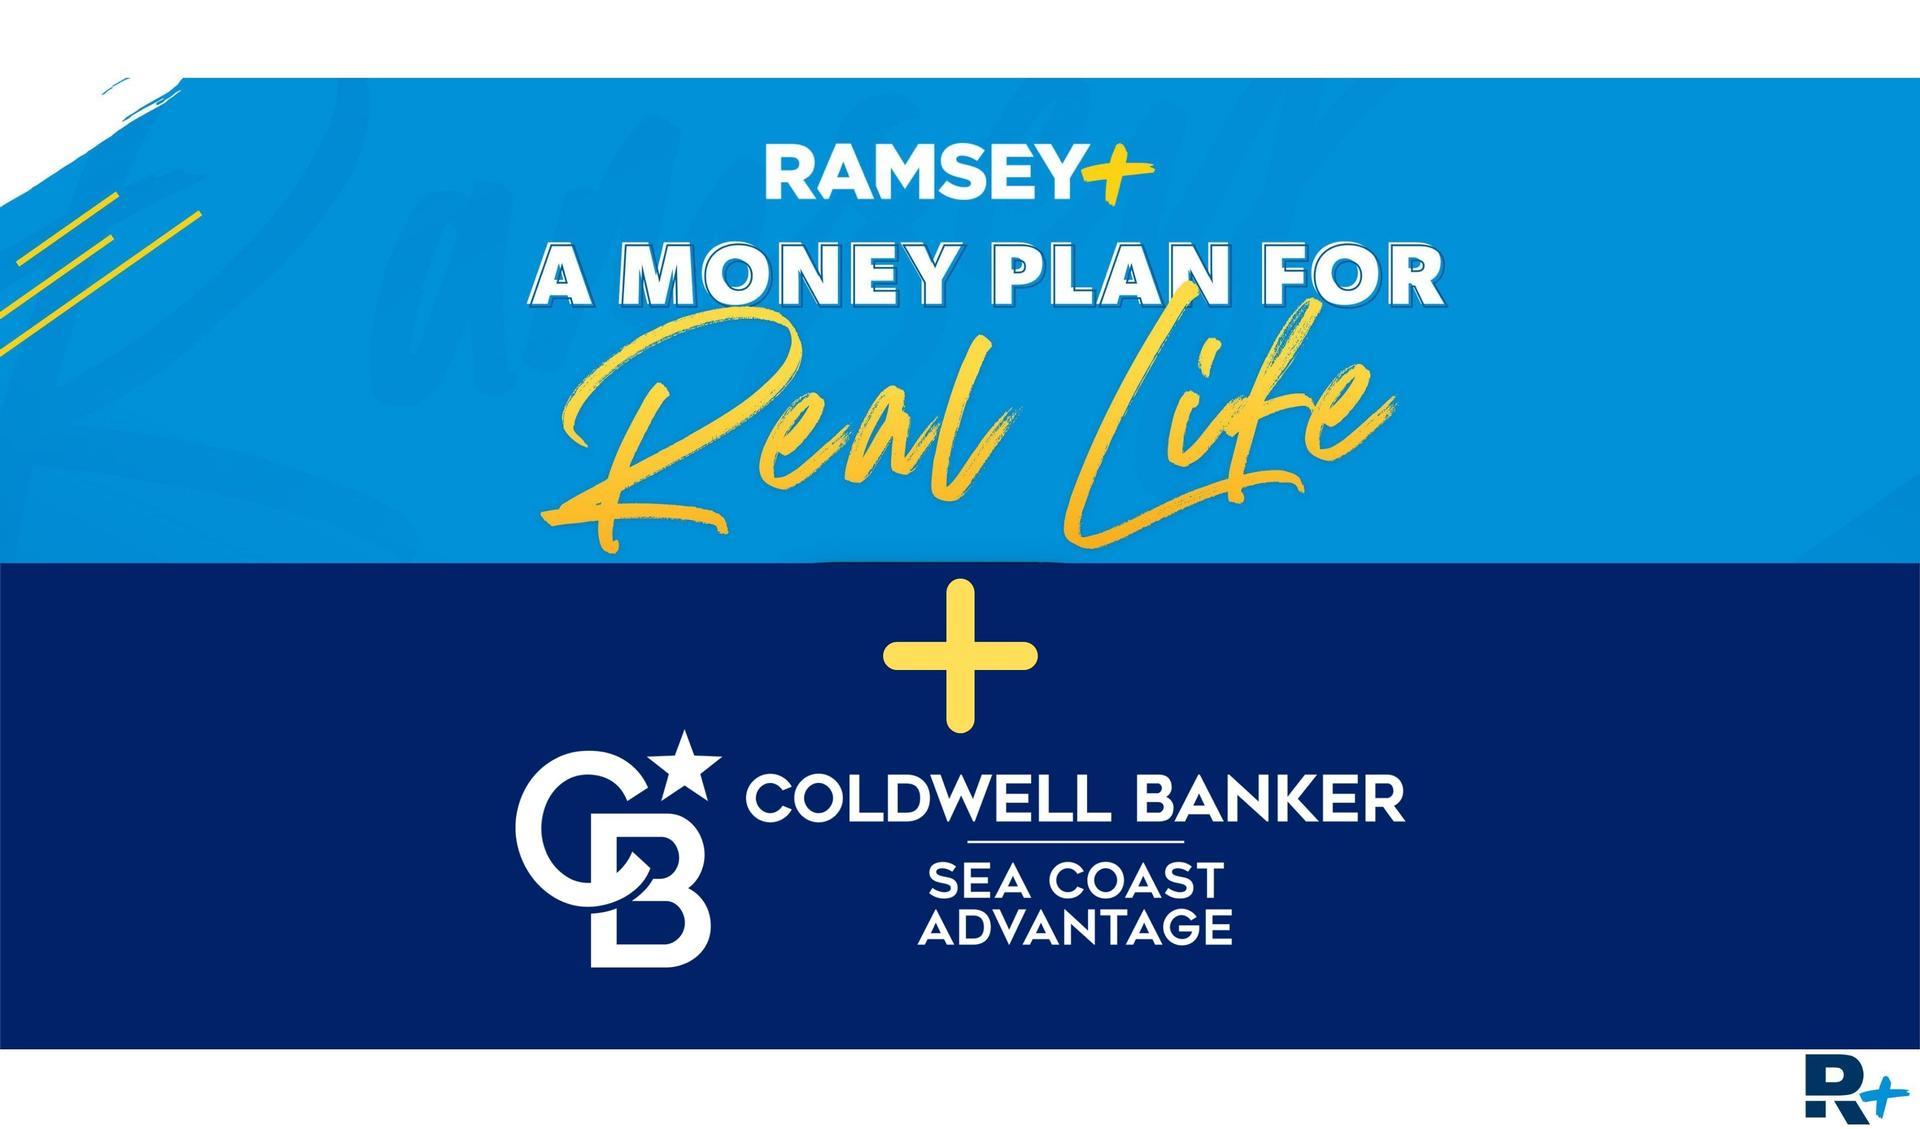 Dave Ramsey Organization Partners with Coldwell Banker Sea Coast Advantage Main Photo